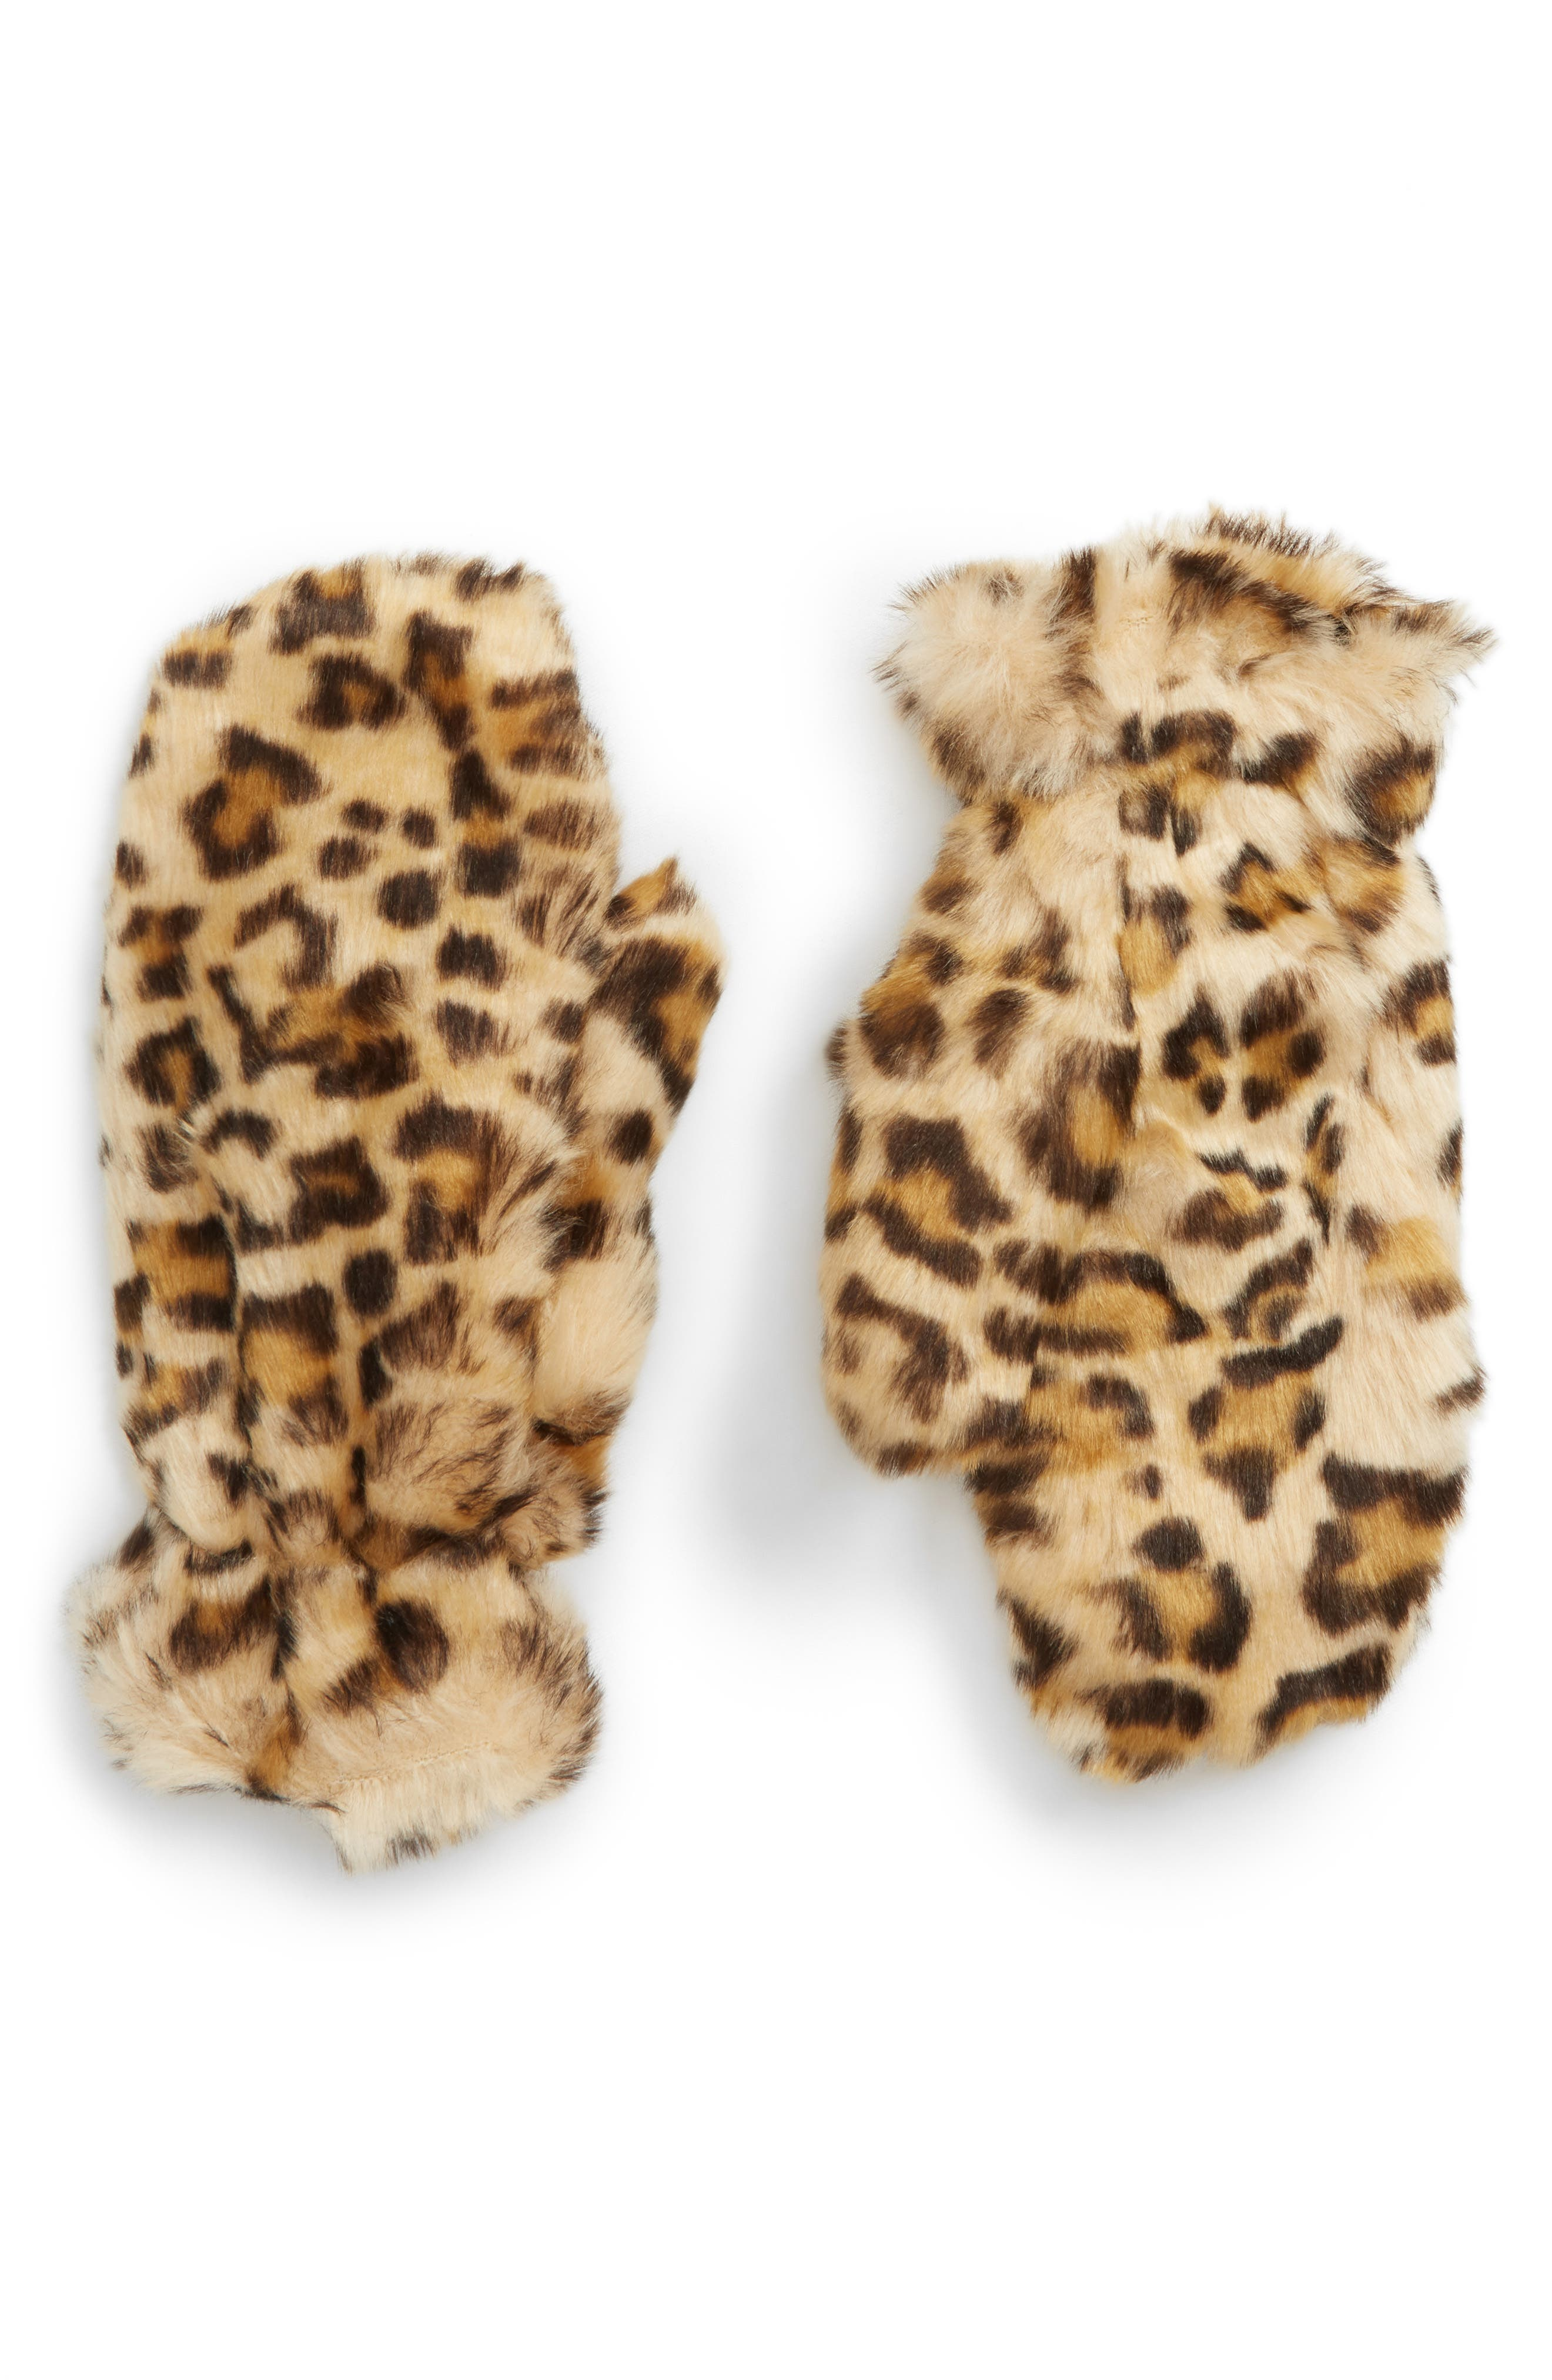 Leopard Print Faux Fur Mittens,                             Main thumbnail 1, color,                             BROWN MULTI